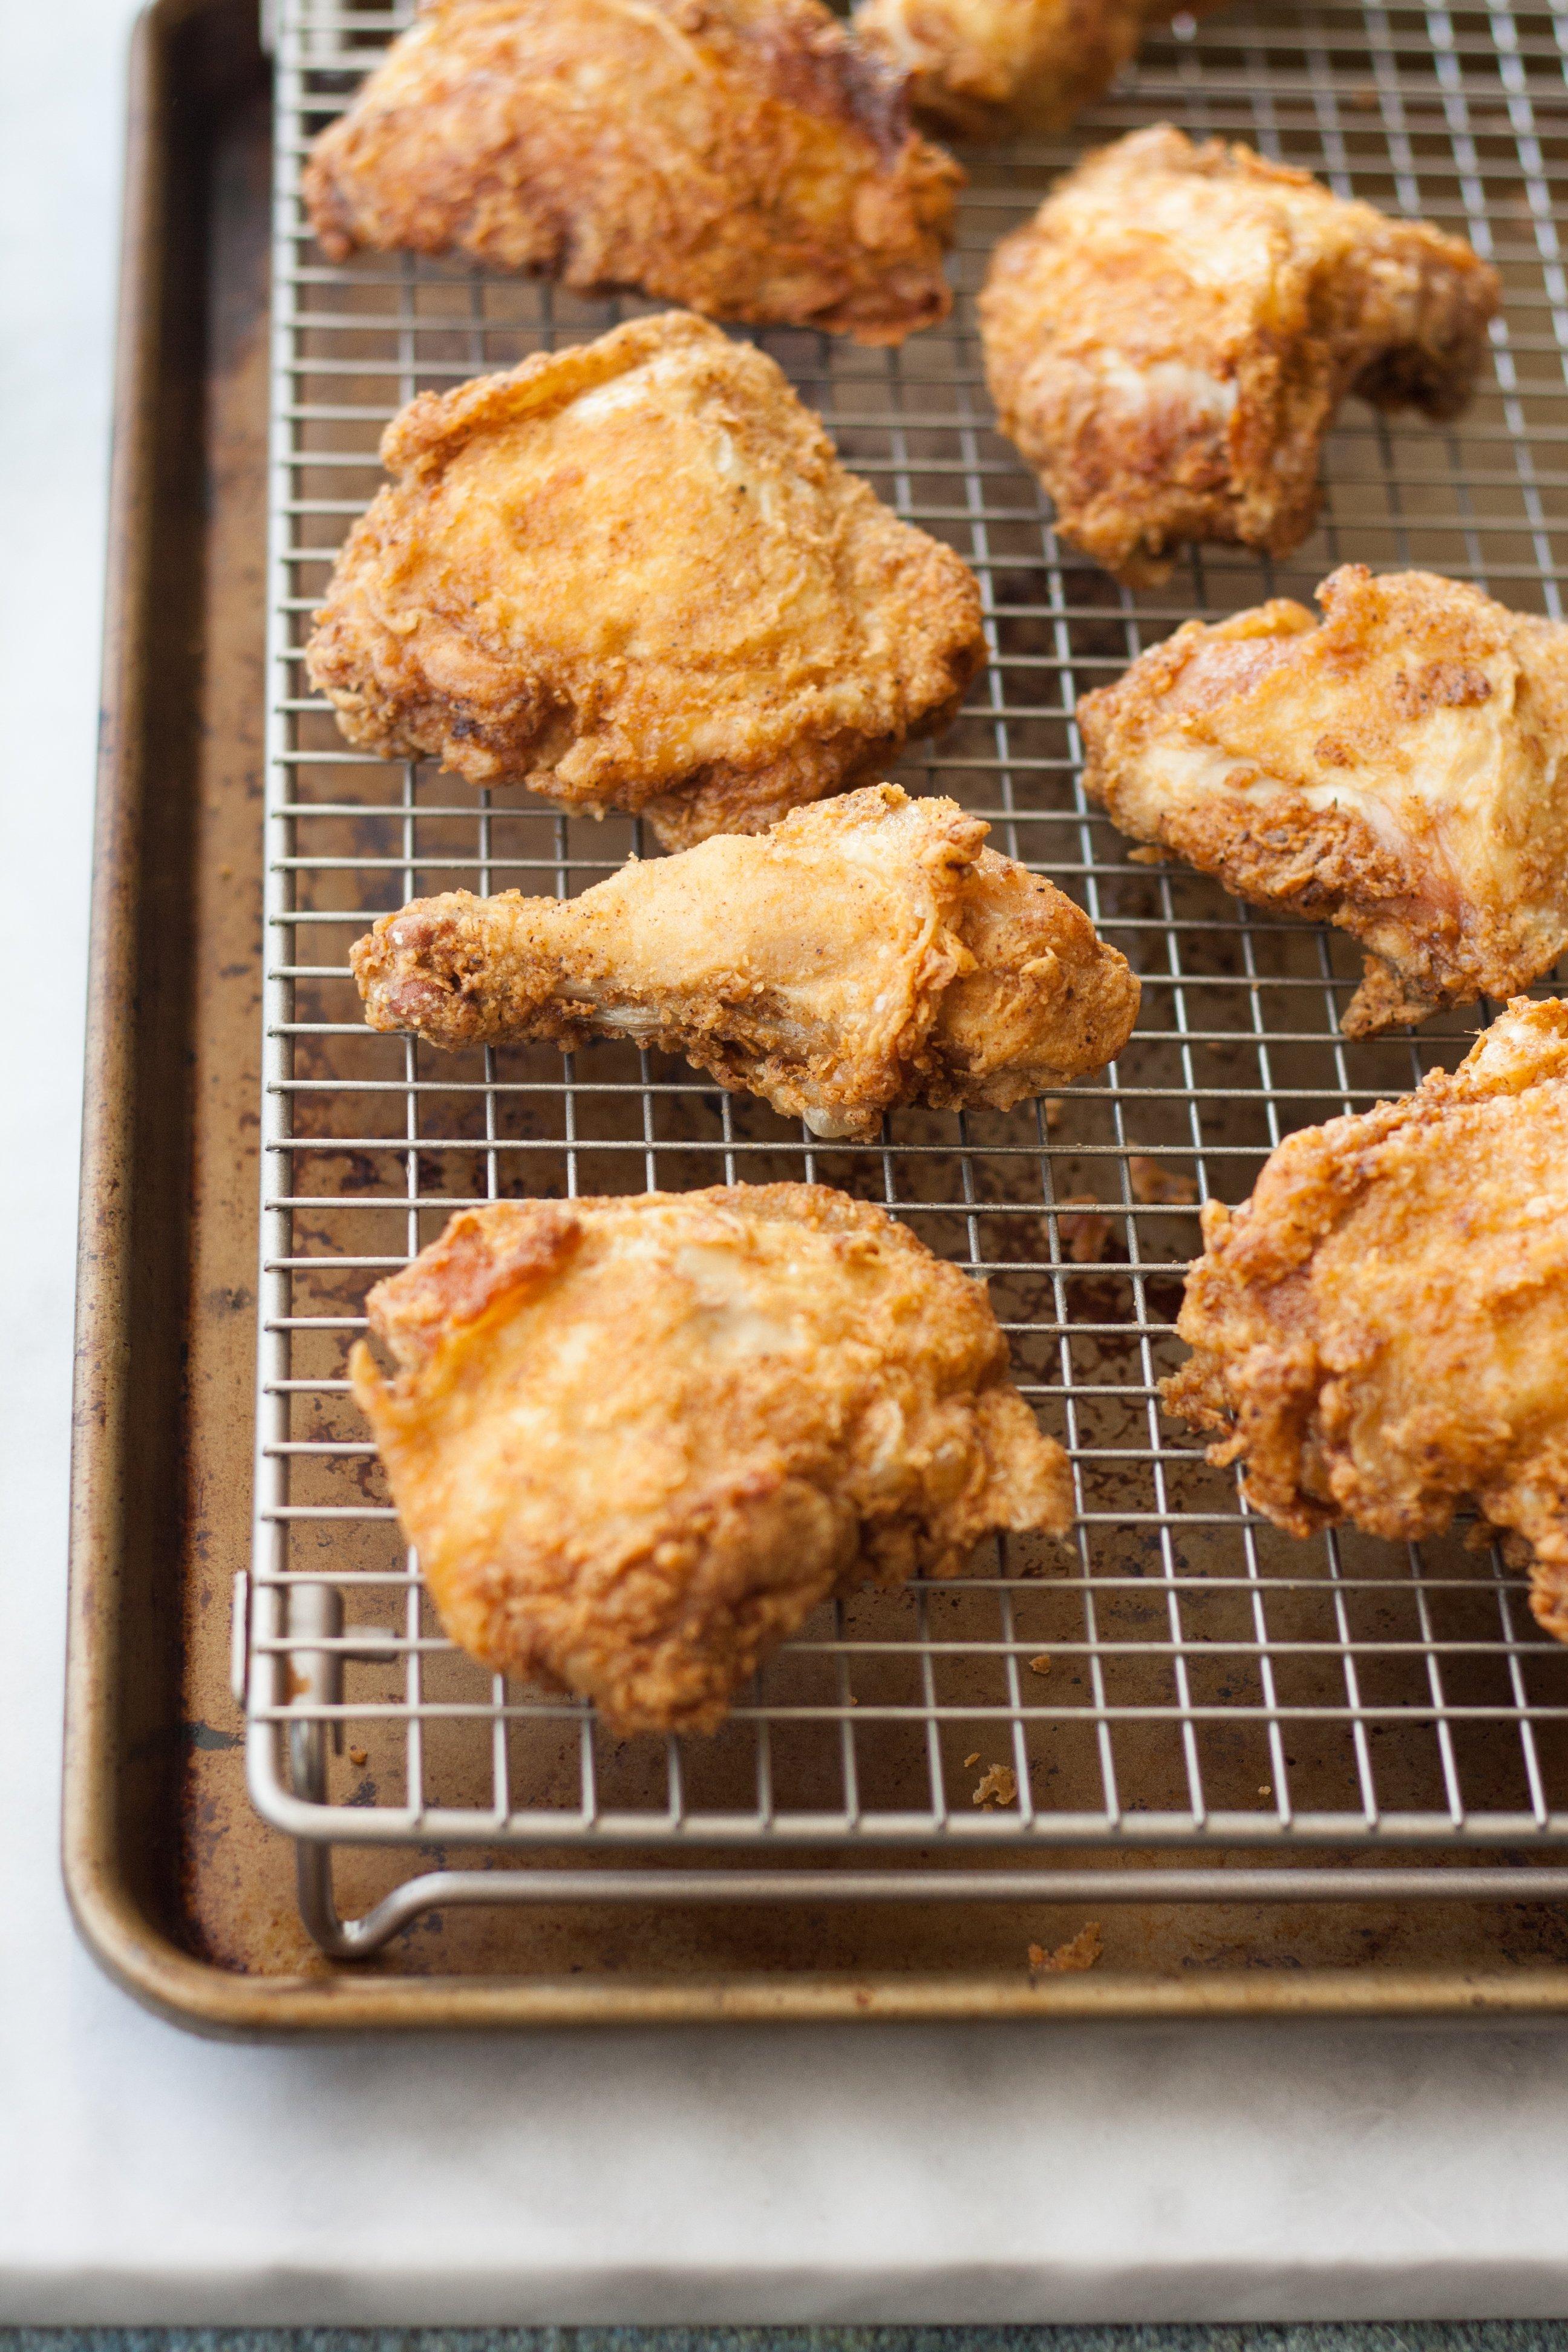 The Best Way To Keep Fried Foods Crispy Kitchn